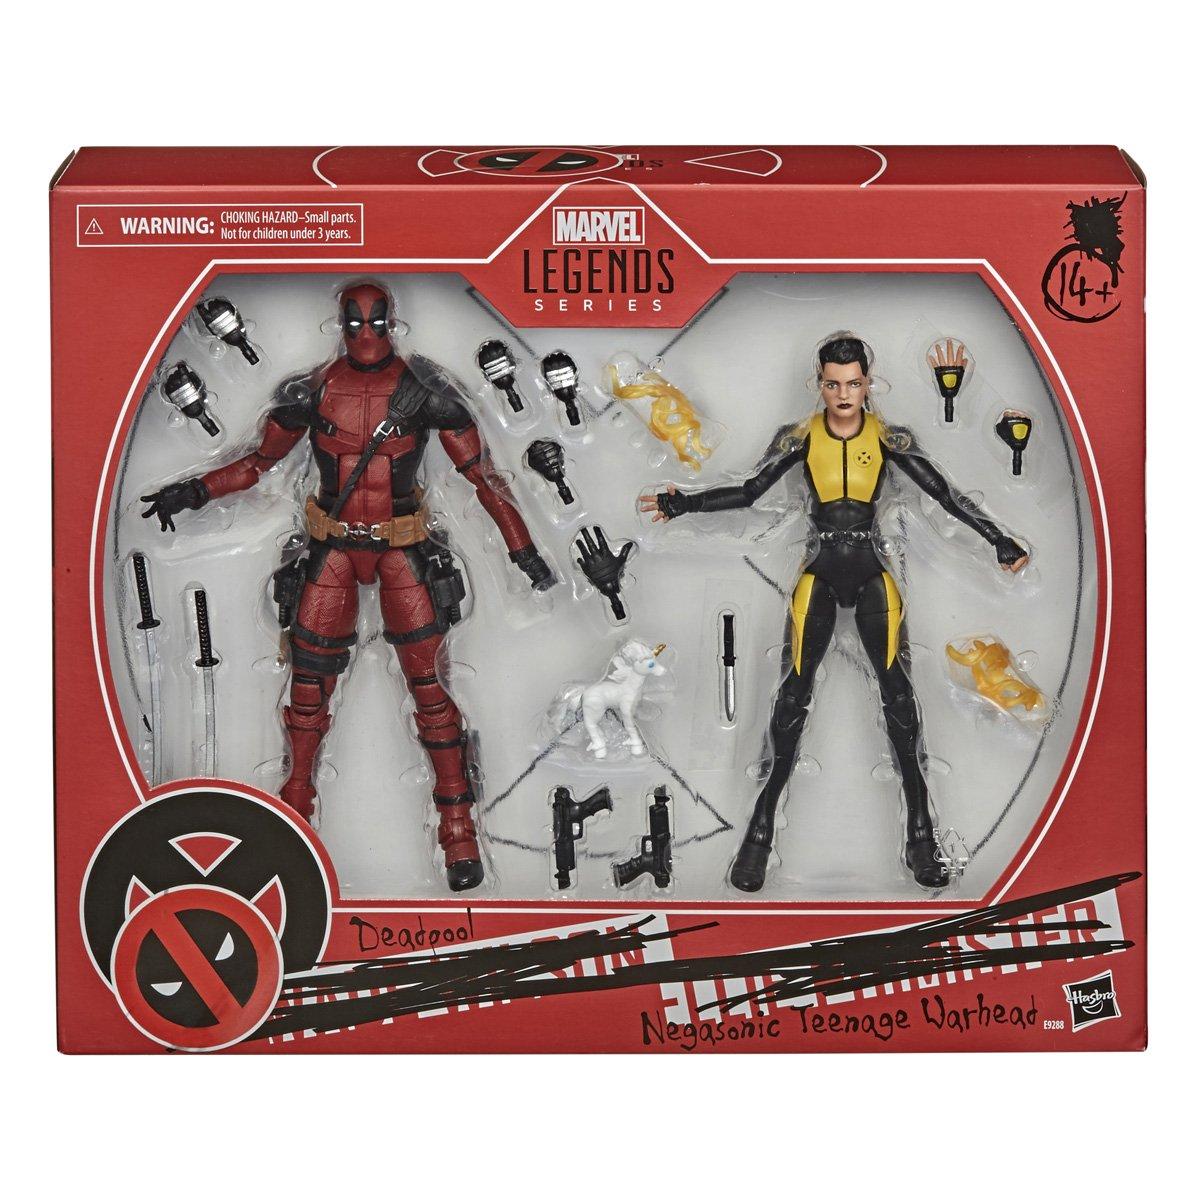 marvel-legends-series-6-inch-deadpool-and-negasonic-teenage-warhead-figure-2-pack-in-pck